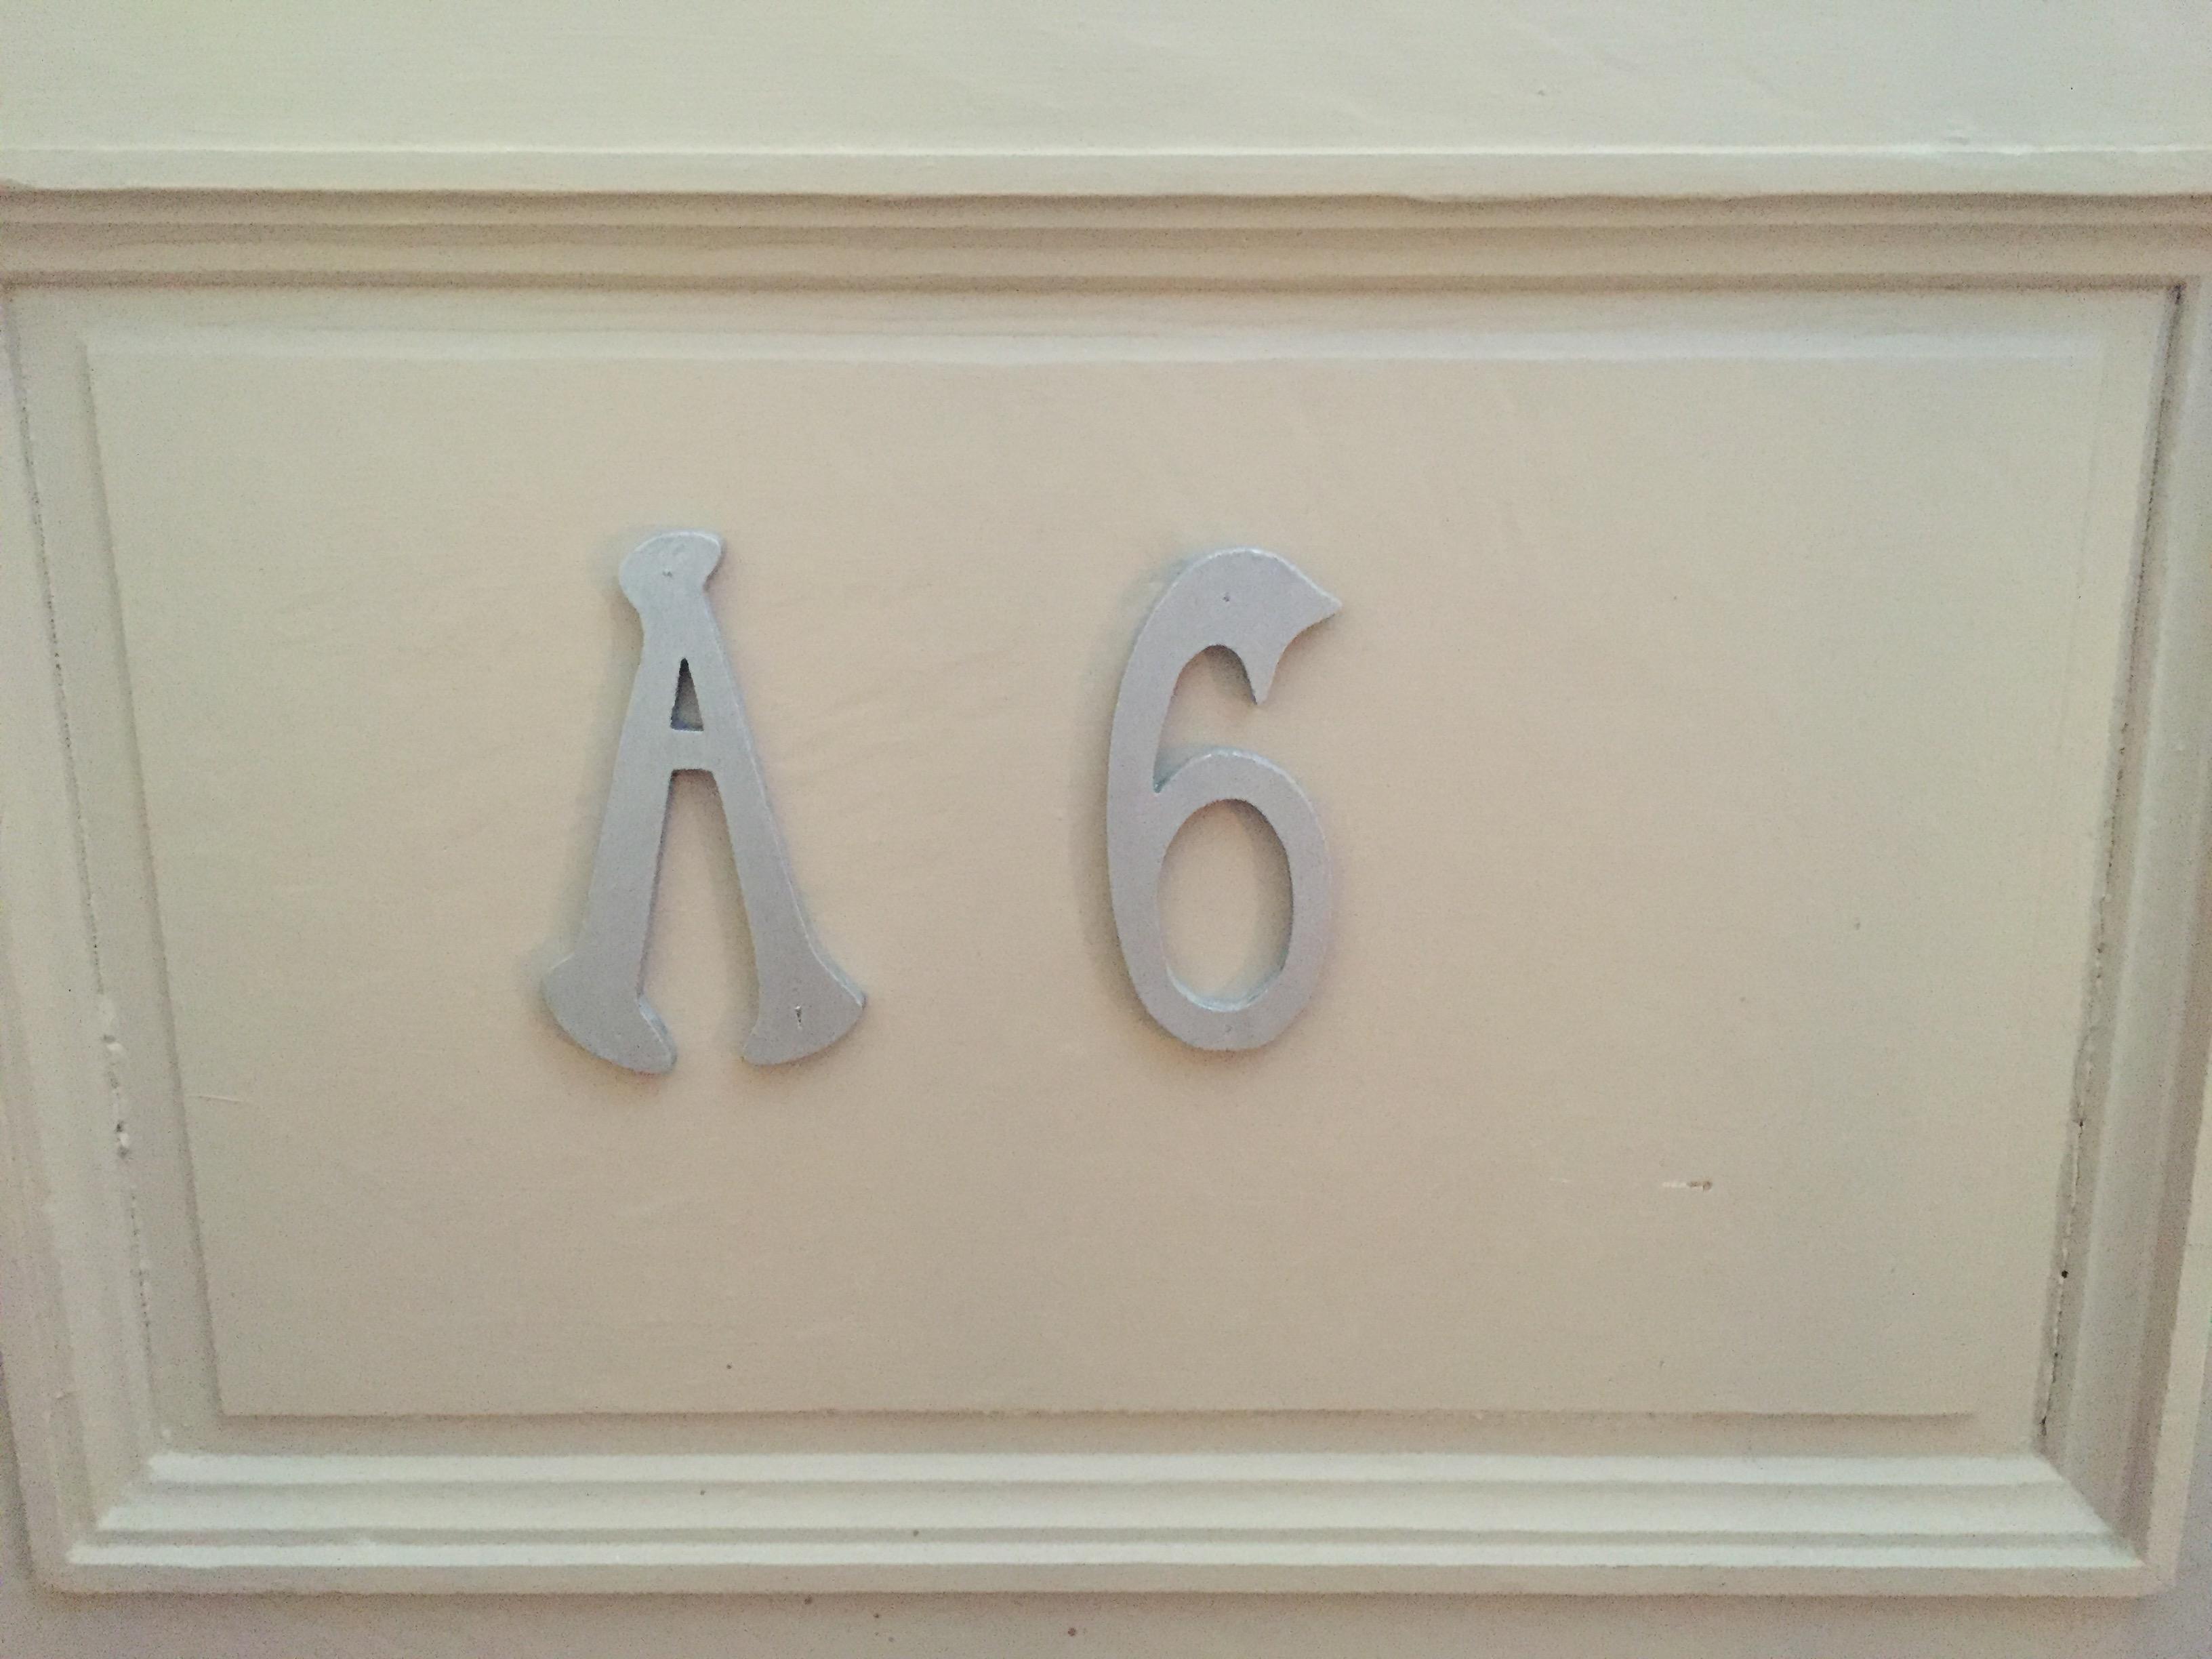 Chambre A6-Dday Aviators